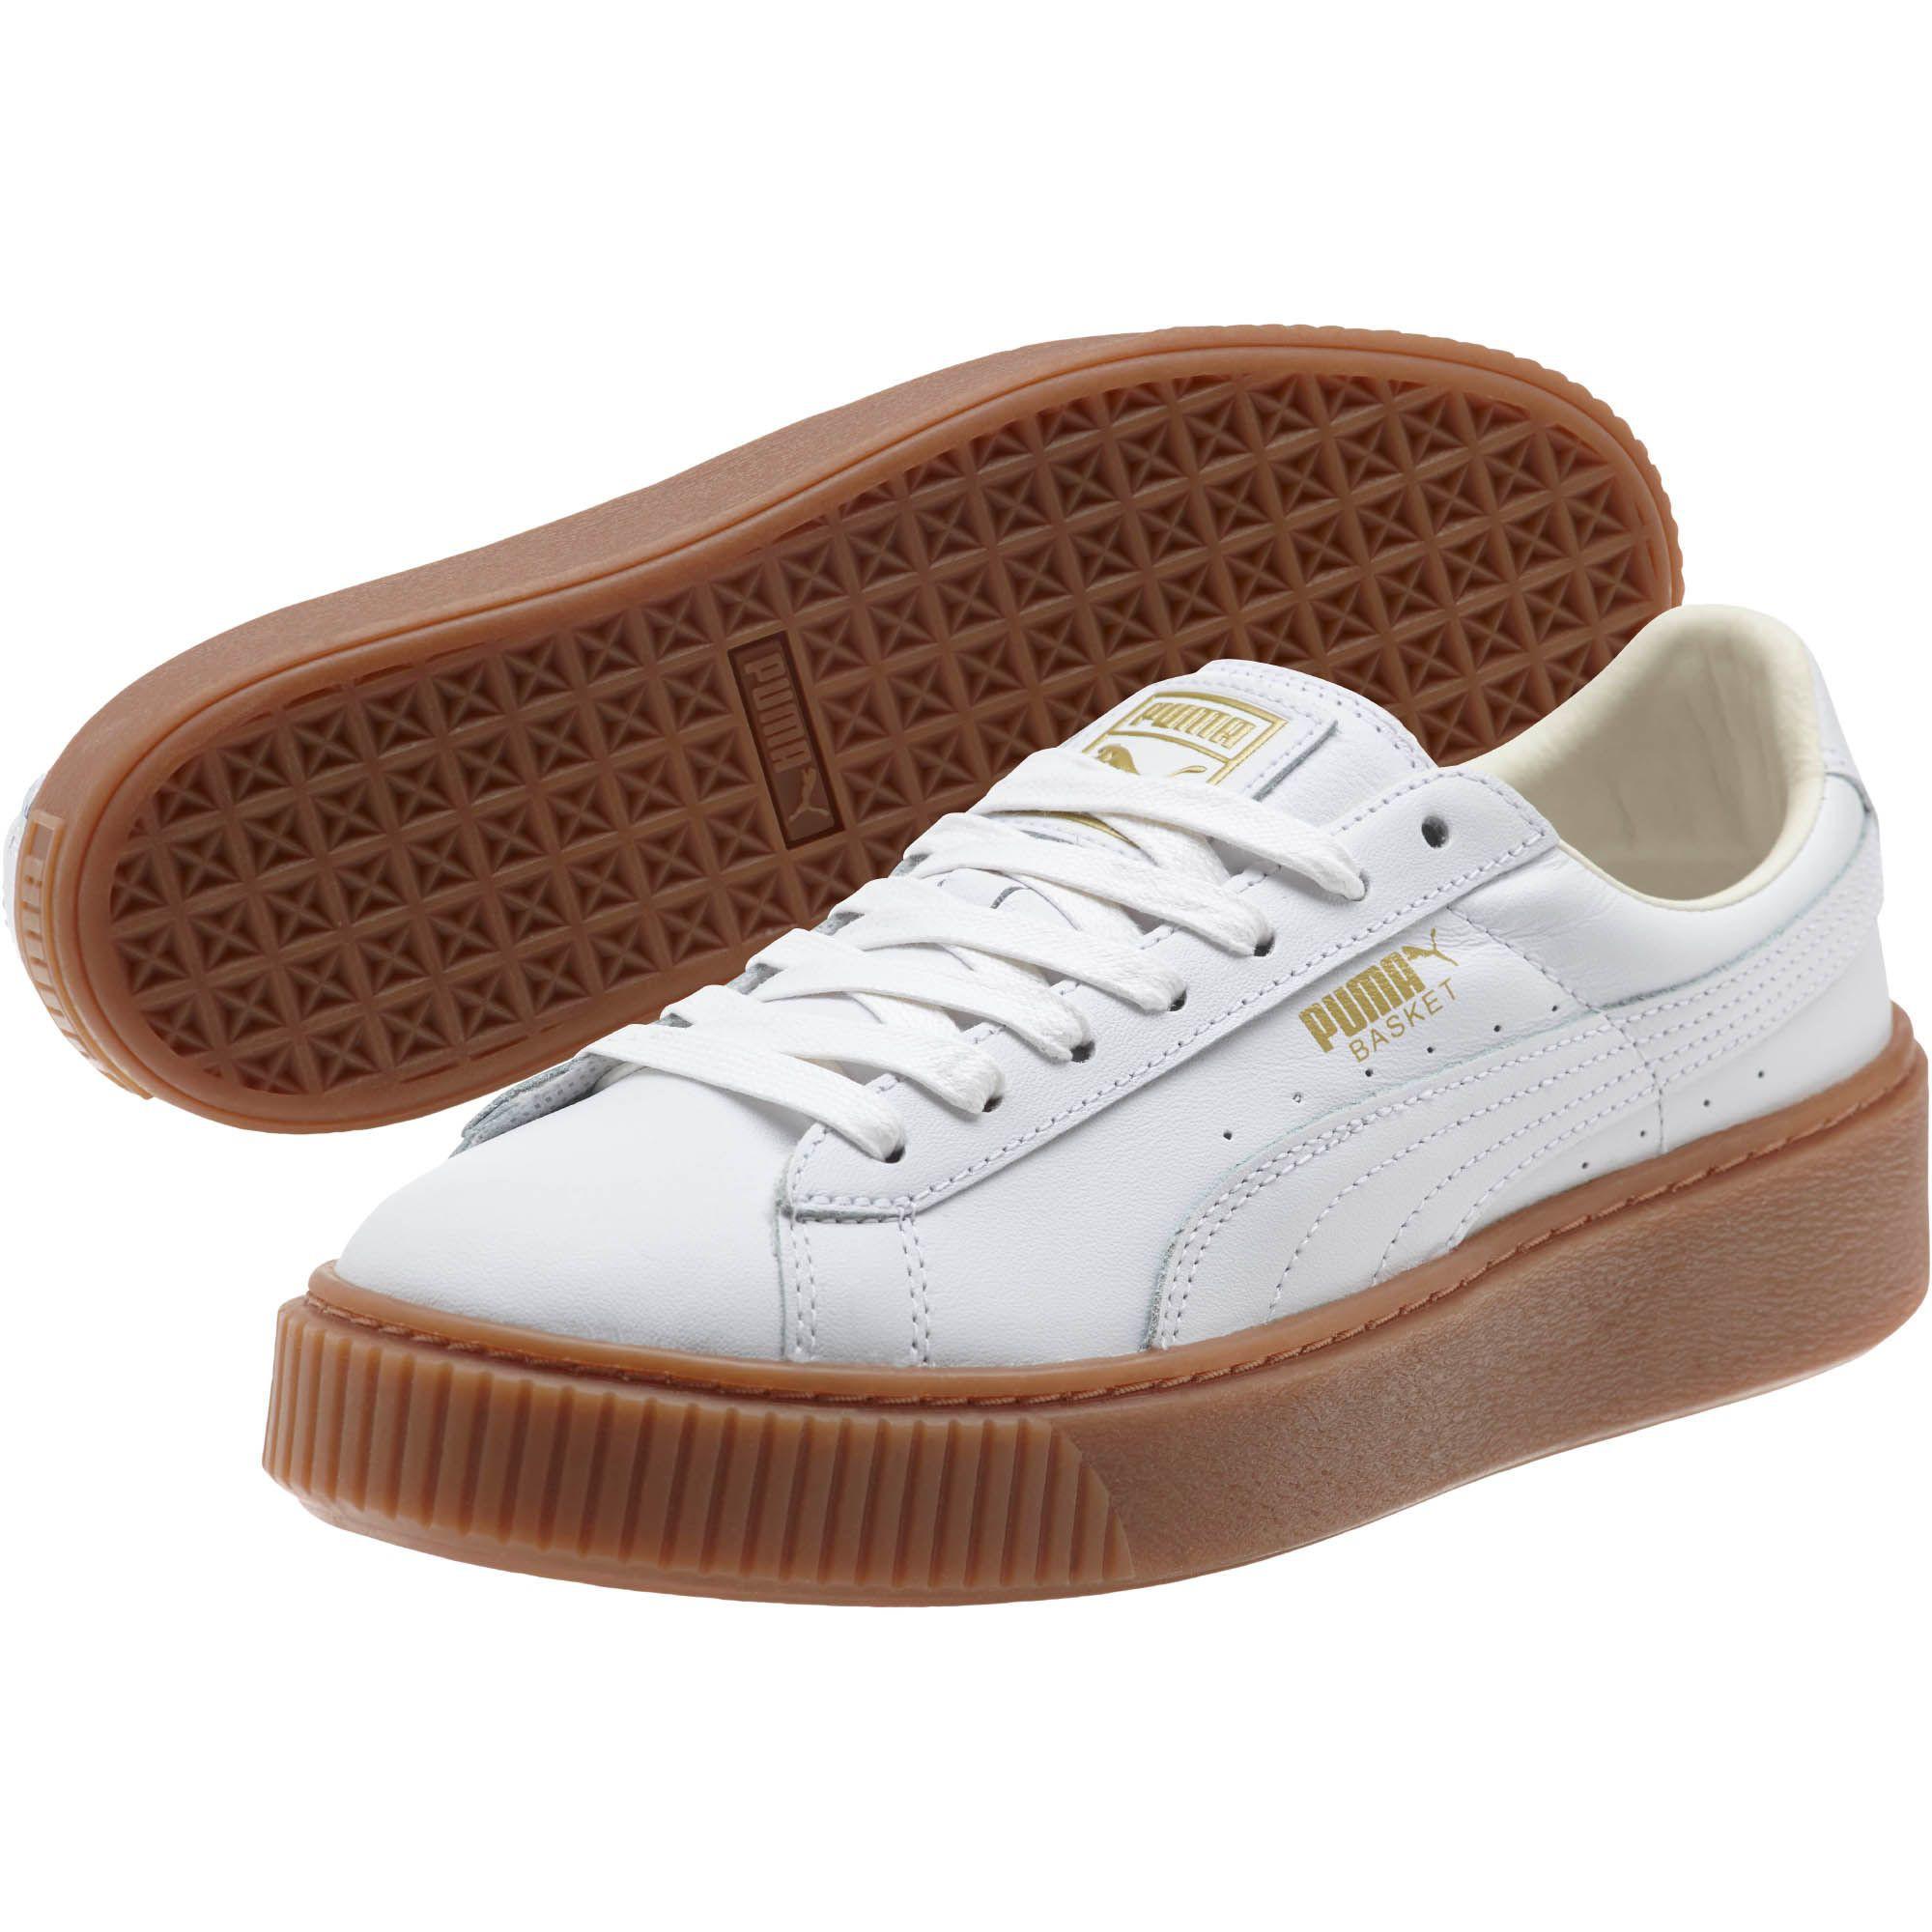 Official puma store puma basket platform core womens sneakers jpg 2000x2000 Basket  puma 8011c7011